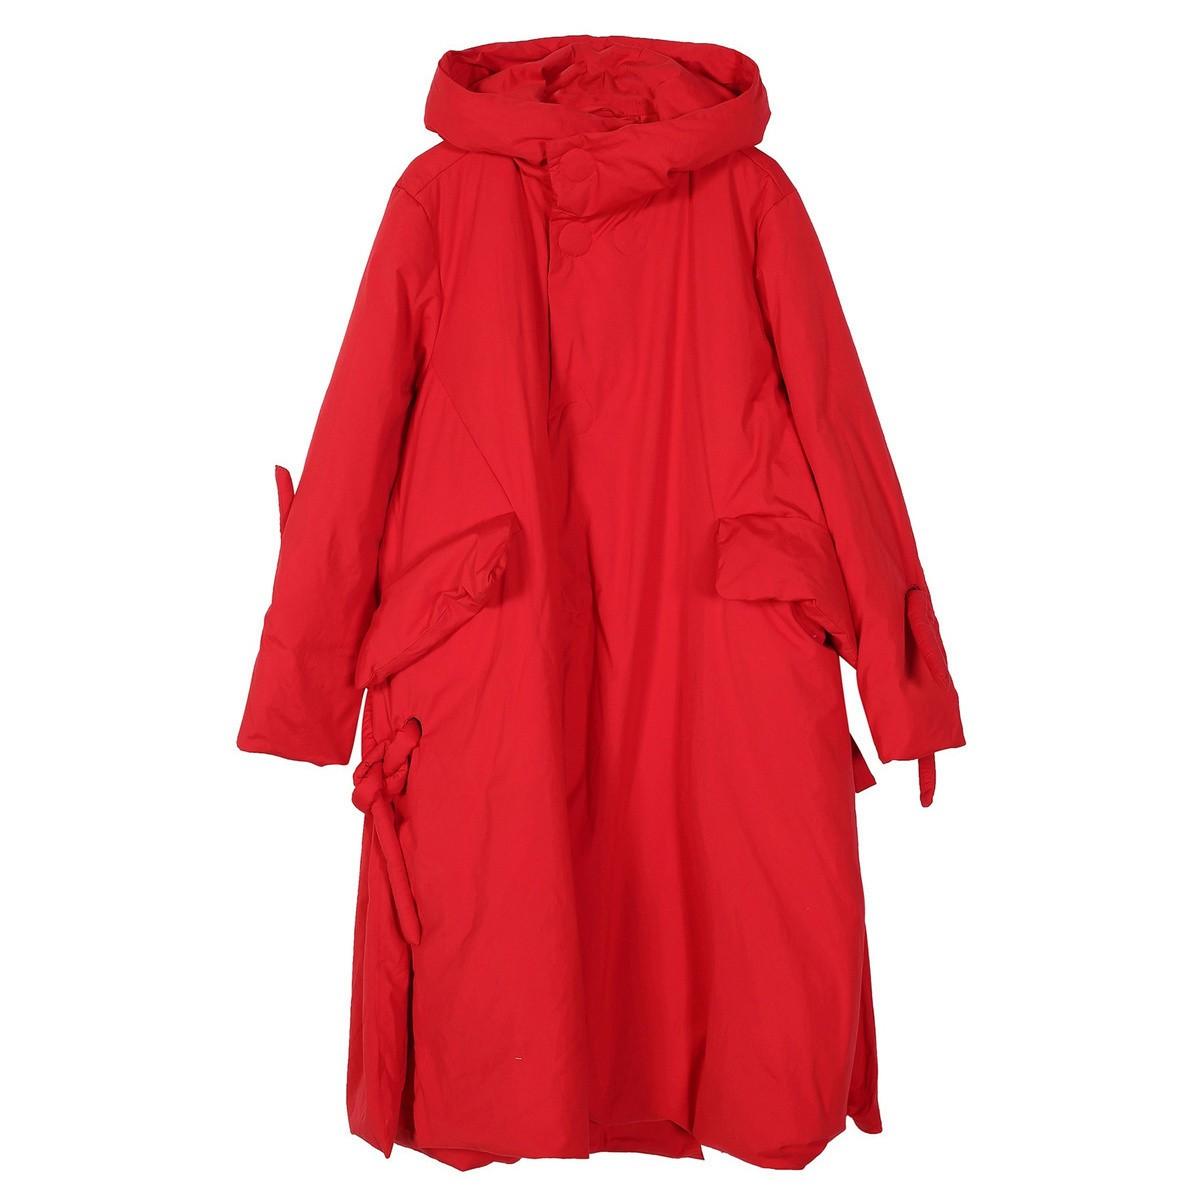 JNBY 江南布衣 女士中长款羽绒服 5IA700291622 正红 S